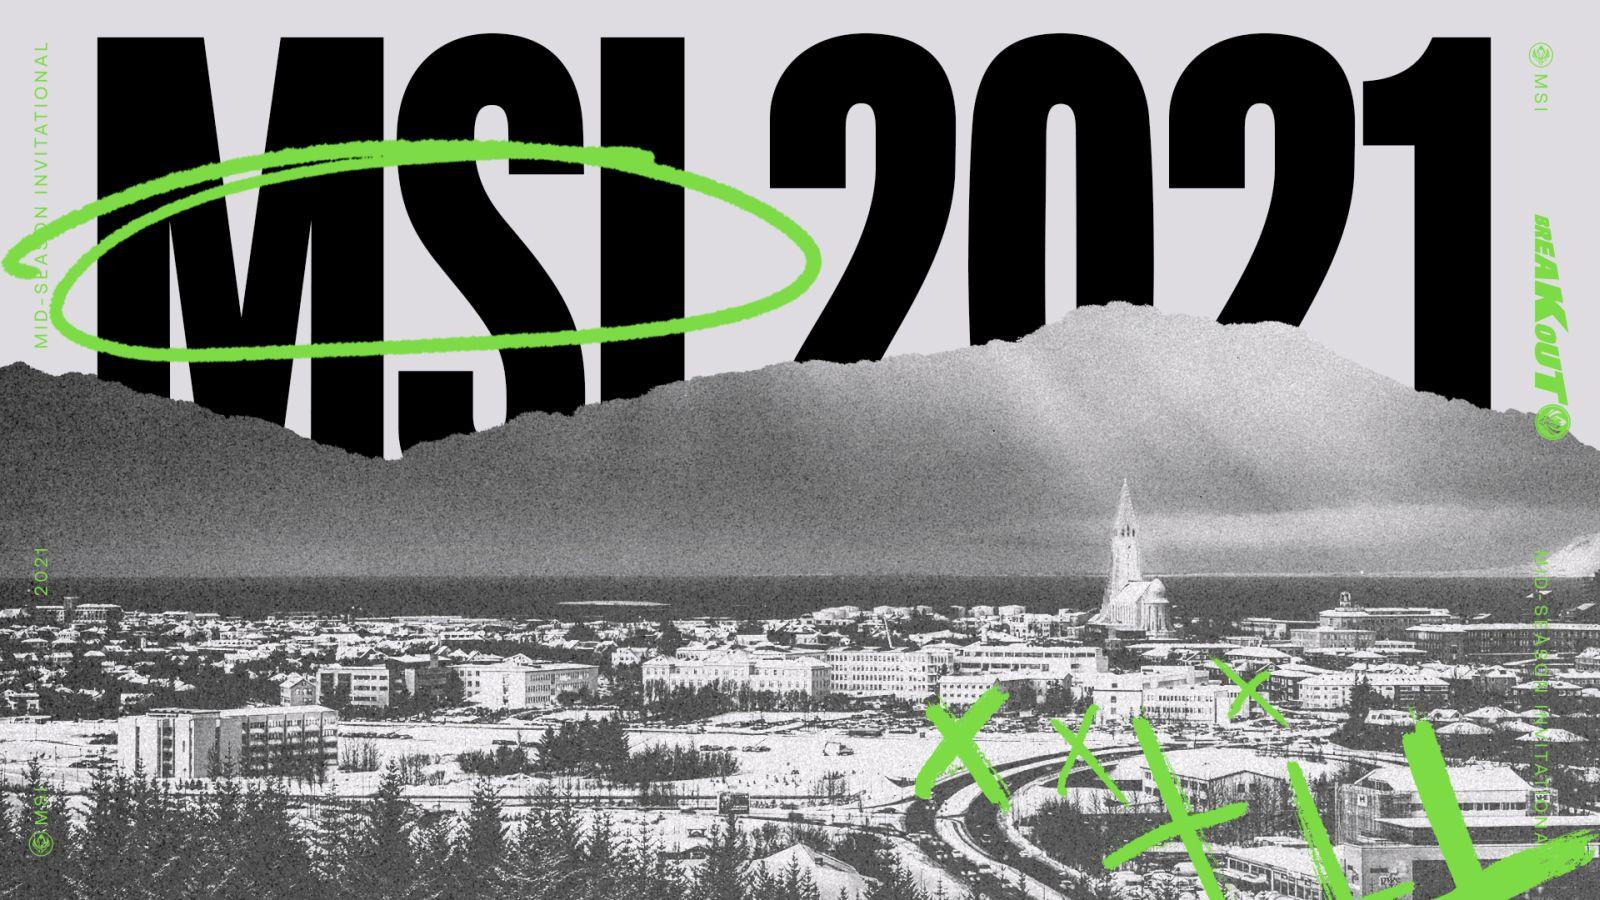 02_msi_2021_announcement_header.jpg - 270.04 kb